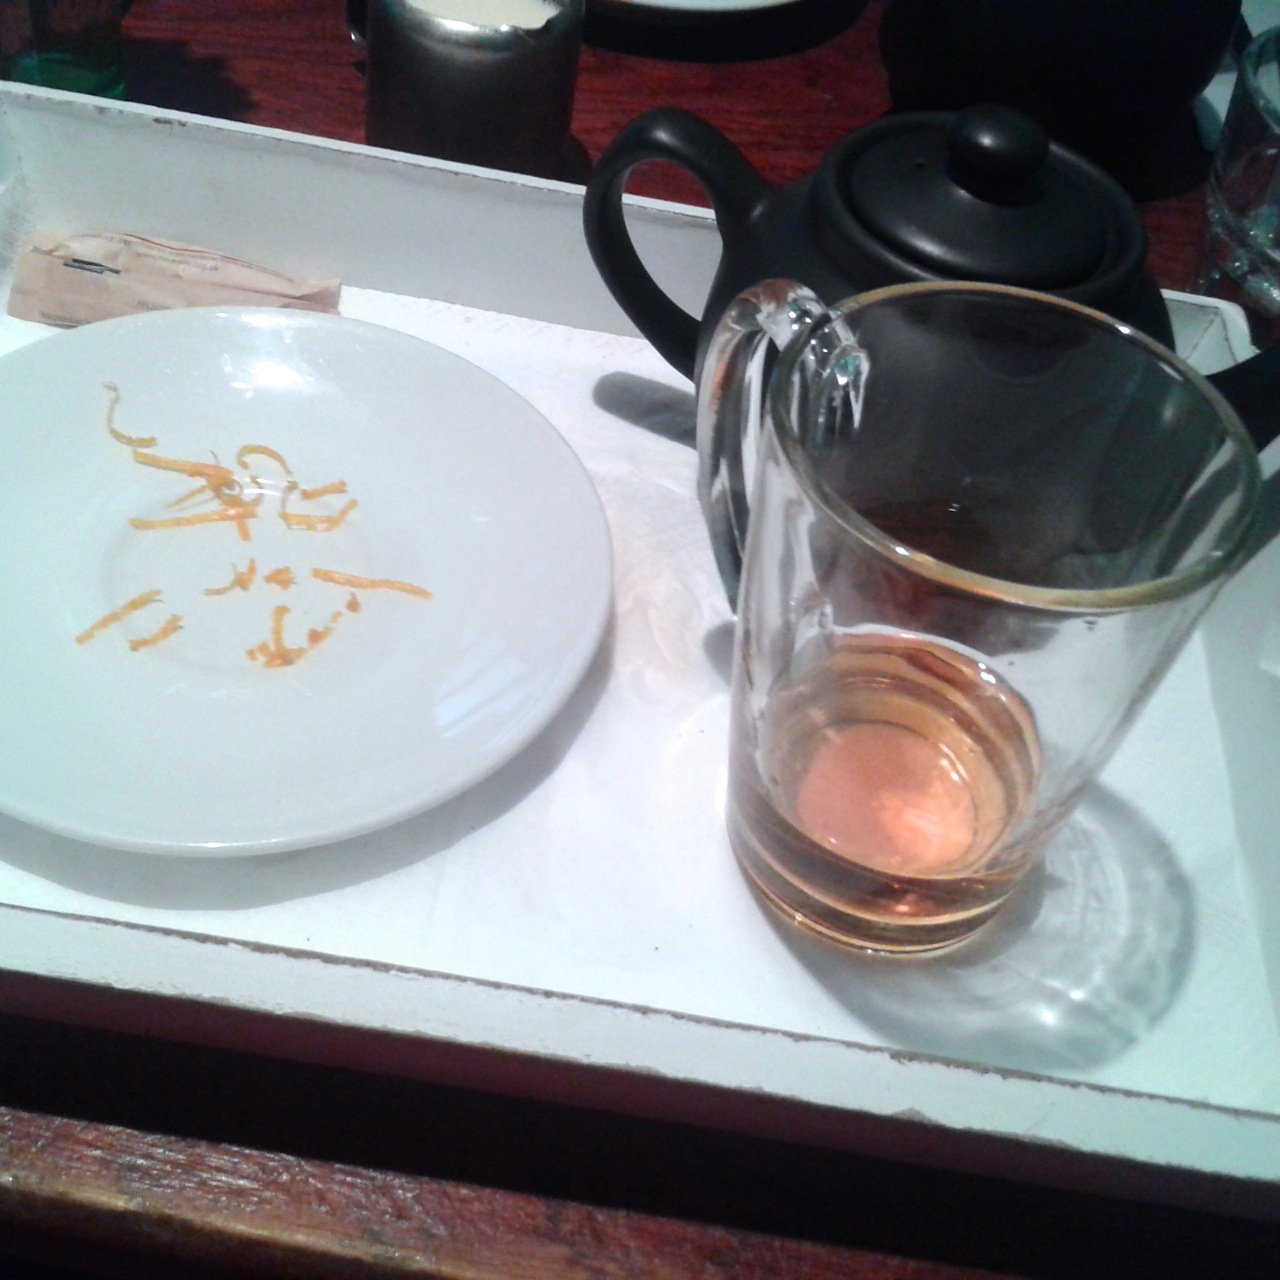 https://i1.wp.com/fatgayvegan.com/wp-content/uploads/2014/12/smoked-whisky.jpg?fit=1280%2C1280